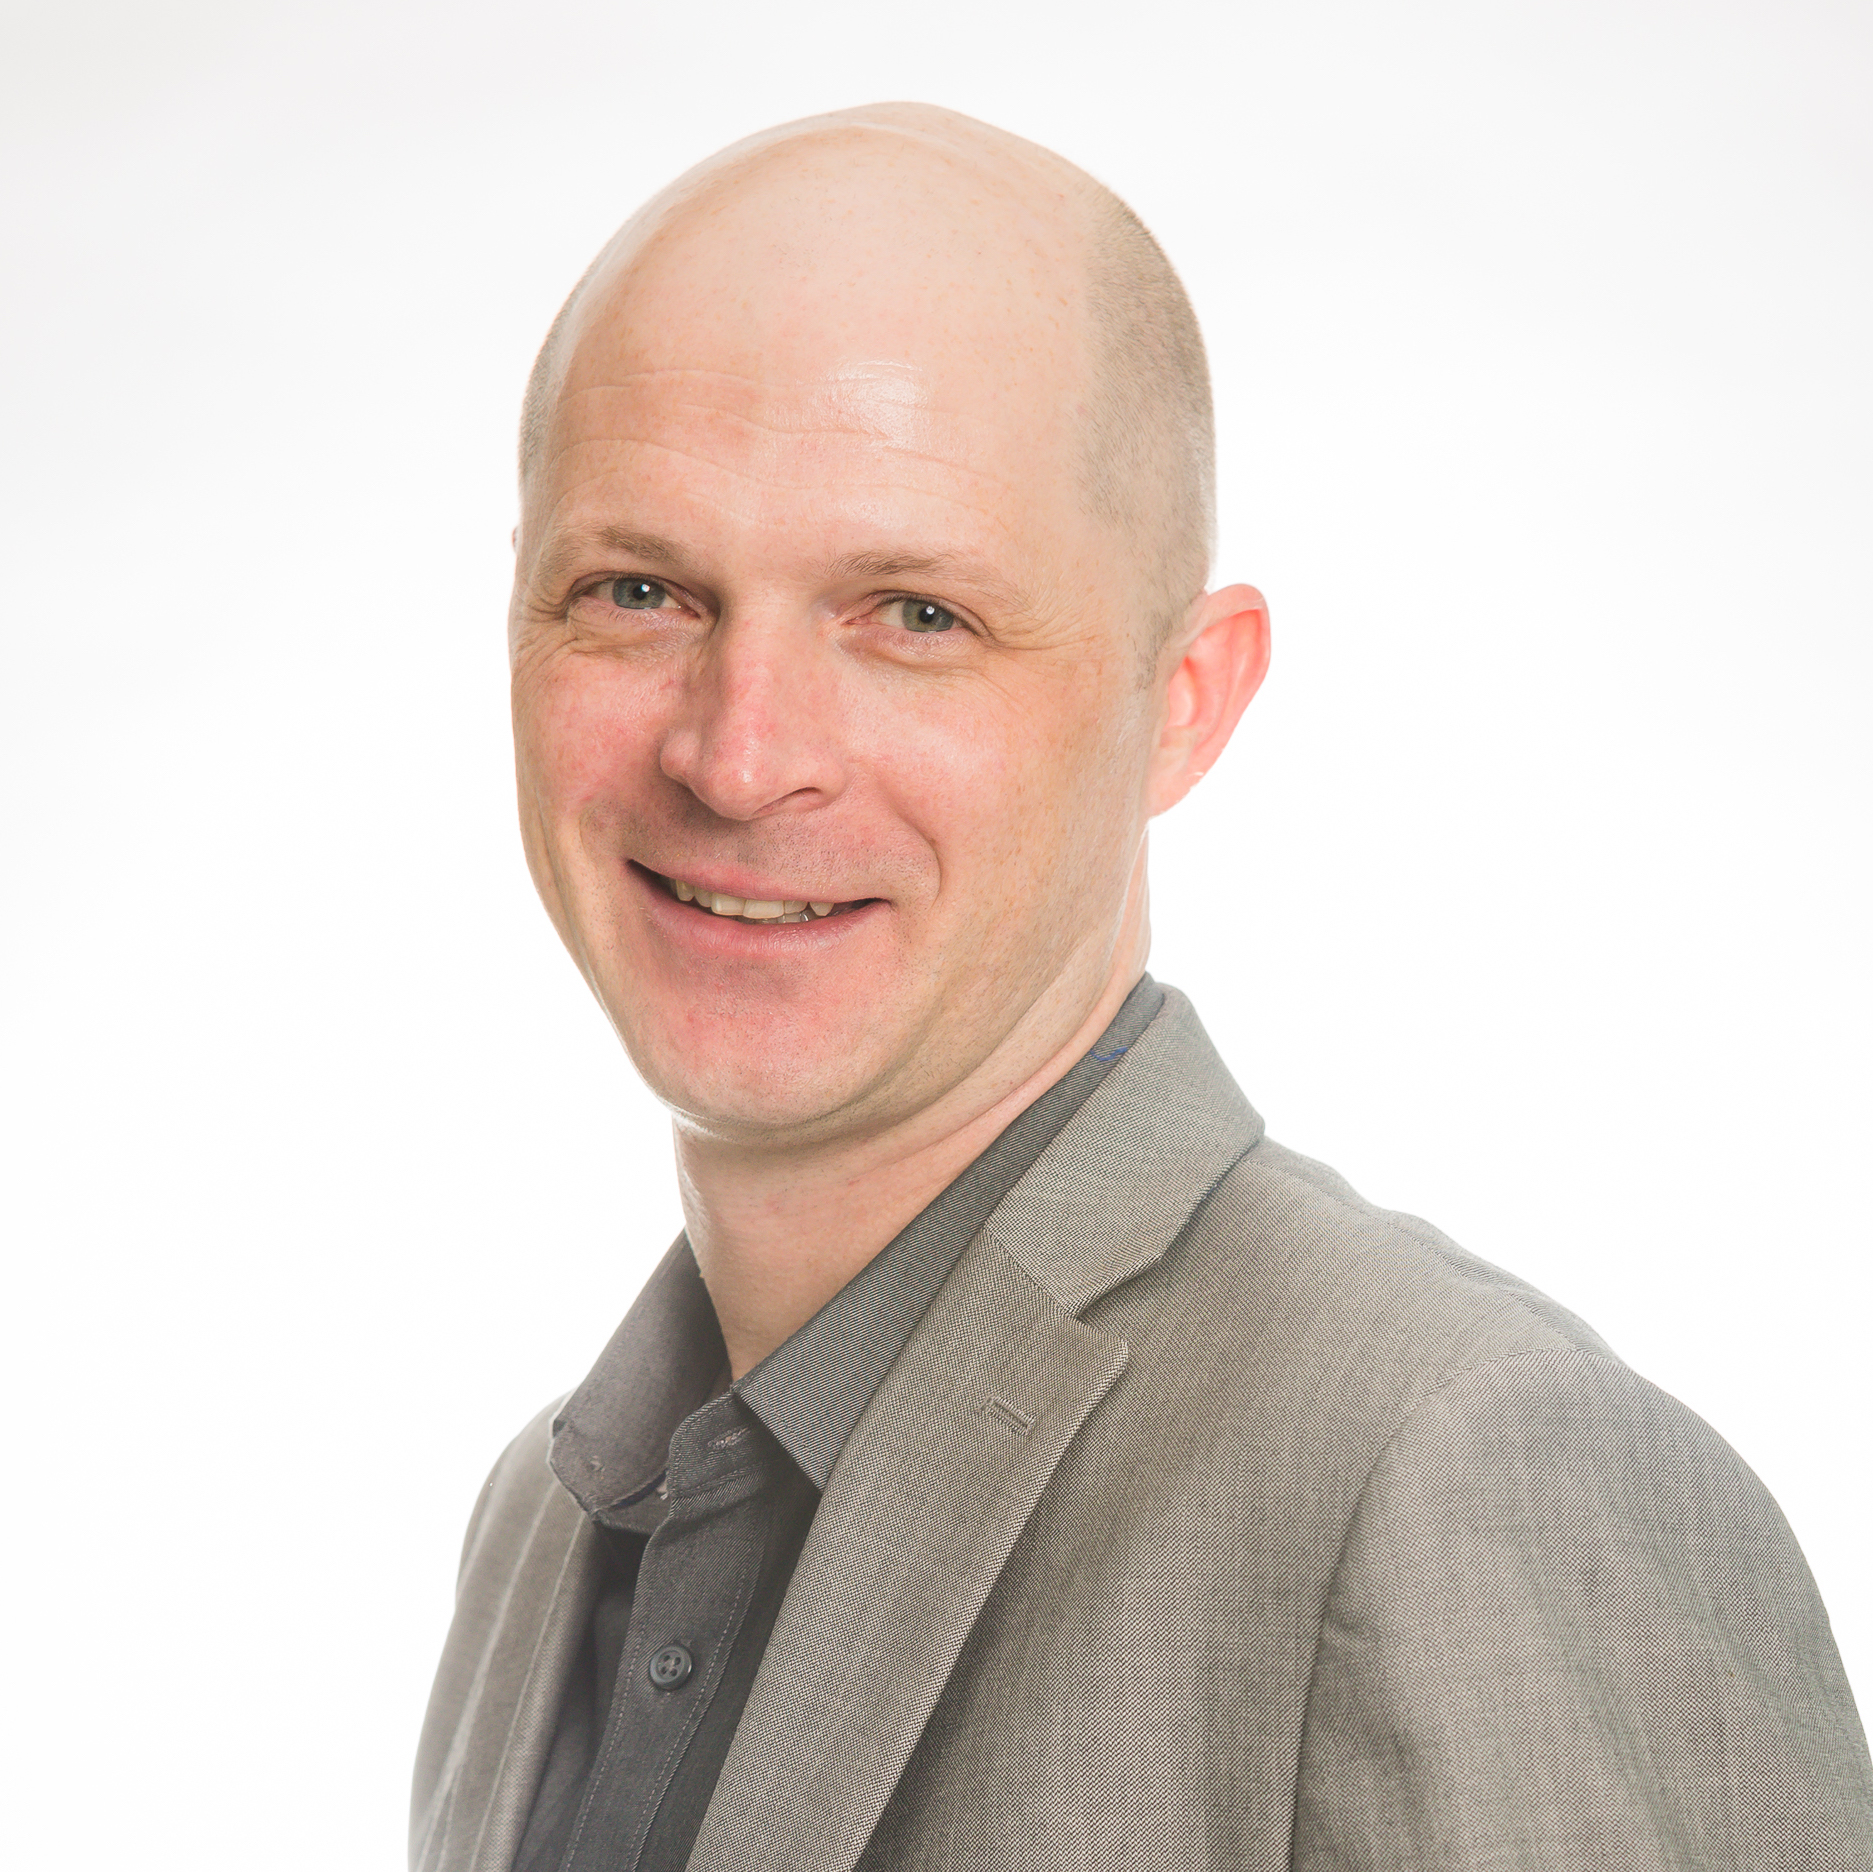 John Wrenn  Chief Information Officer, Information Technollogy, Flex